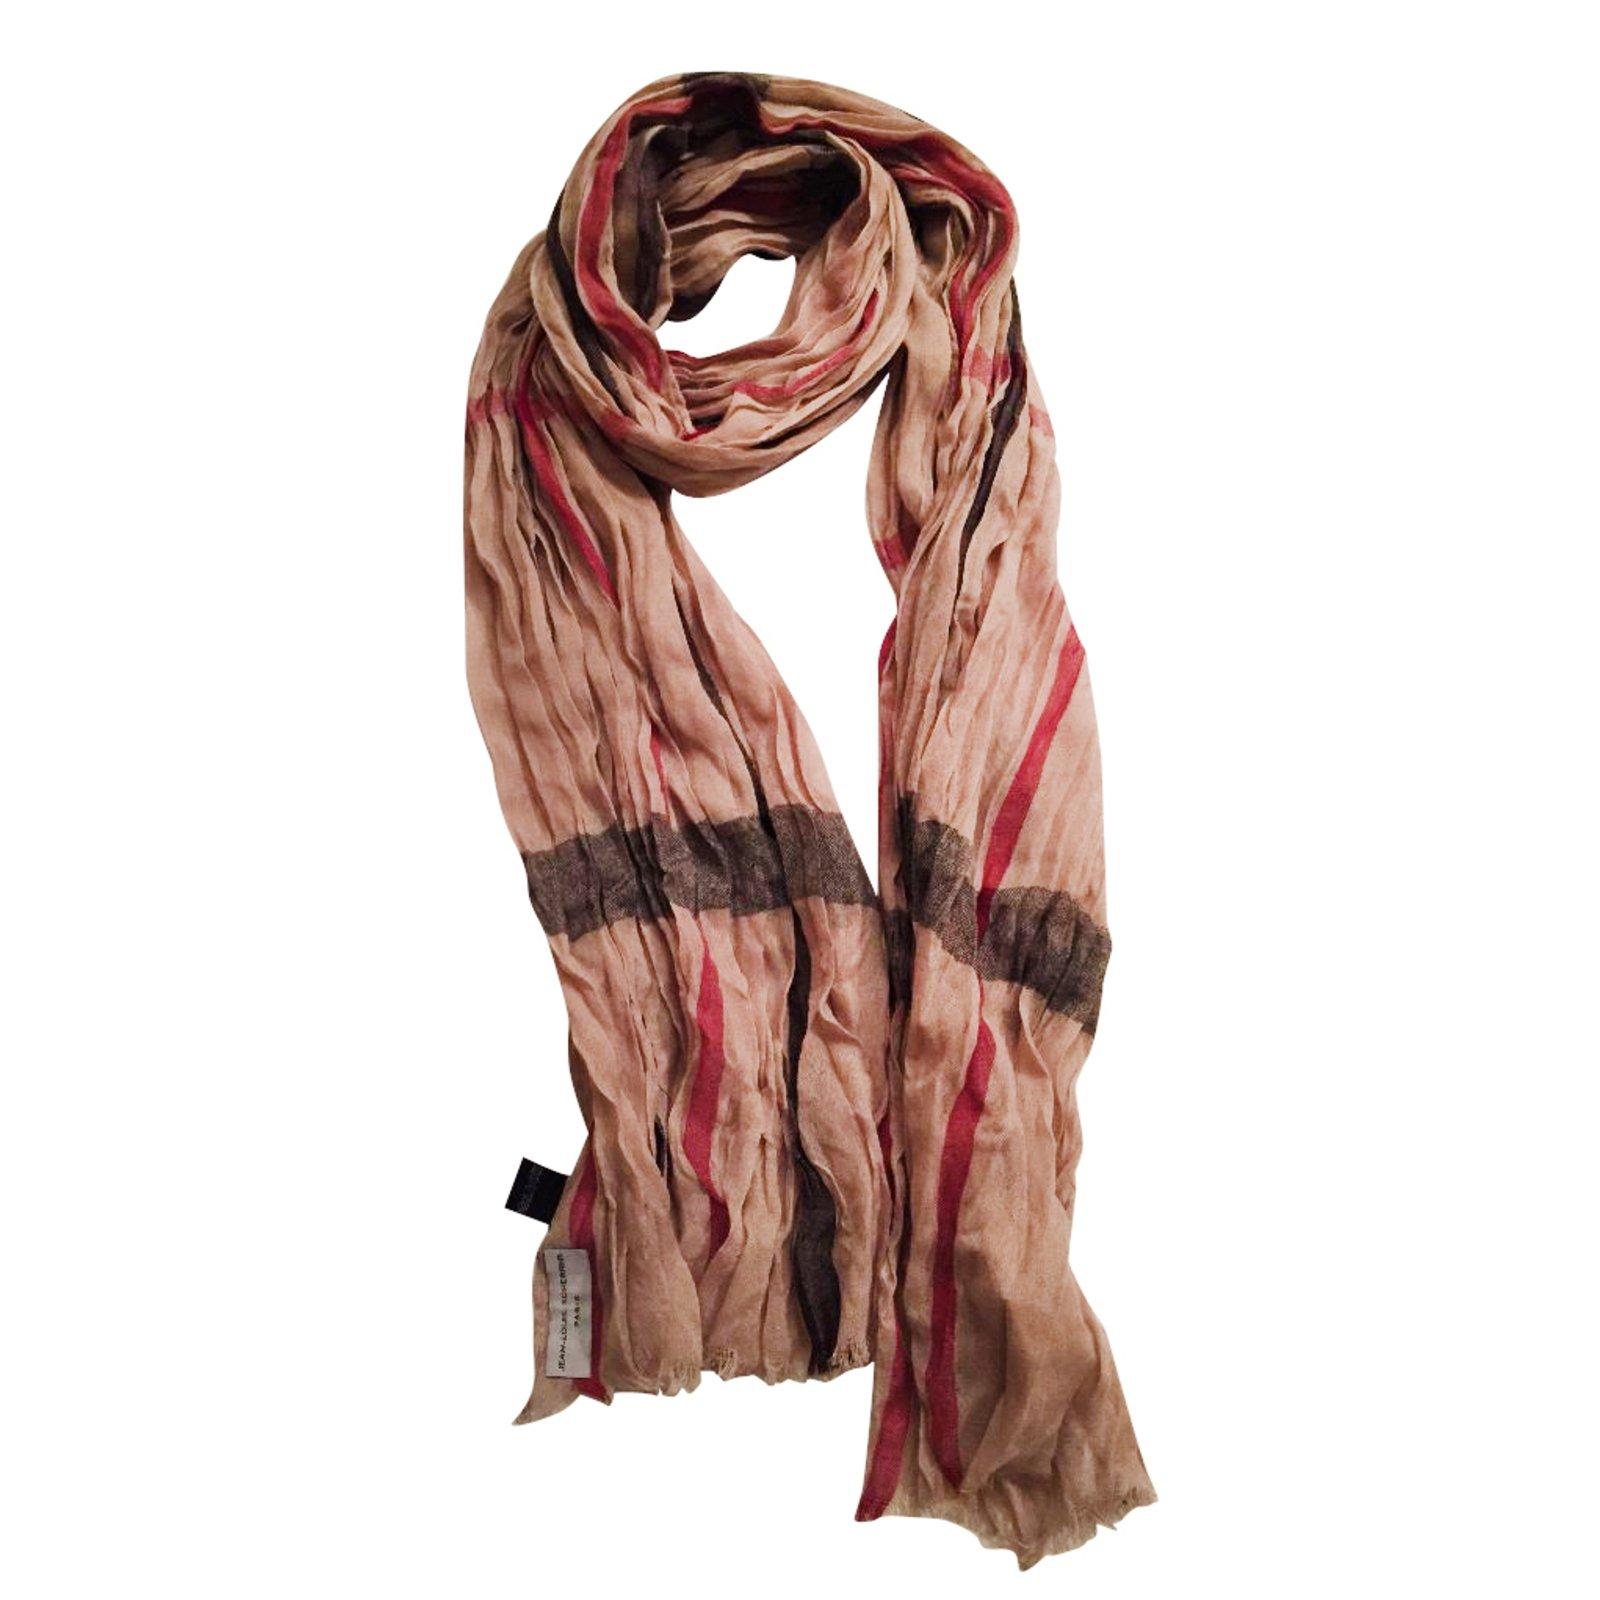 foulards jean louis scherrer foulards polyester multicolore joli closet. Black Bedroom Furniture Sets. Home Design Ideas